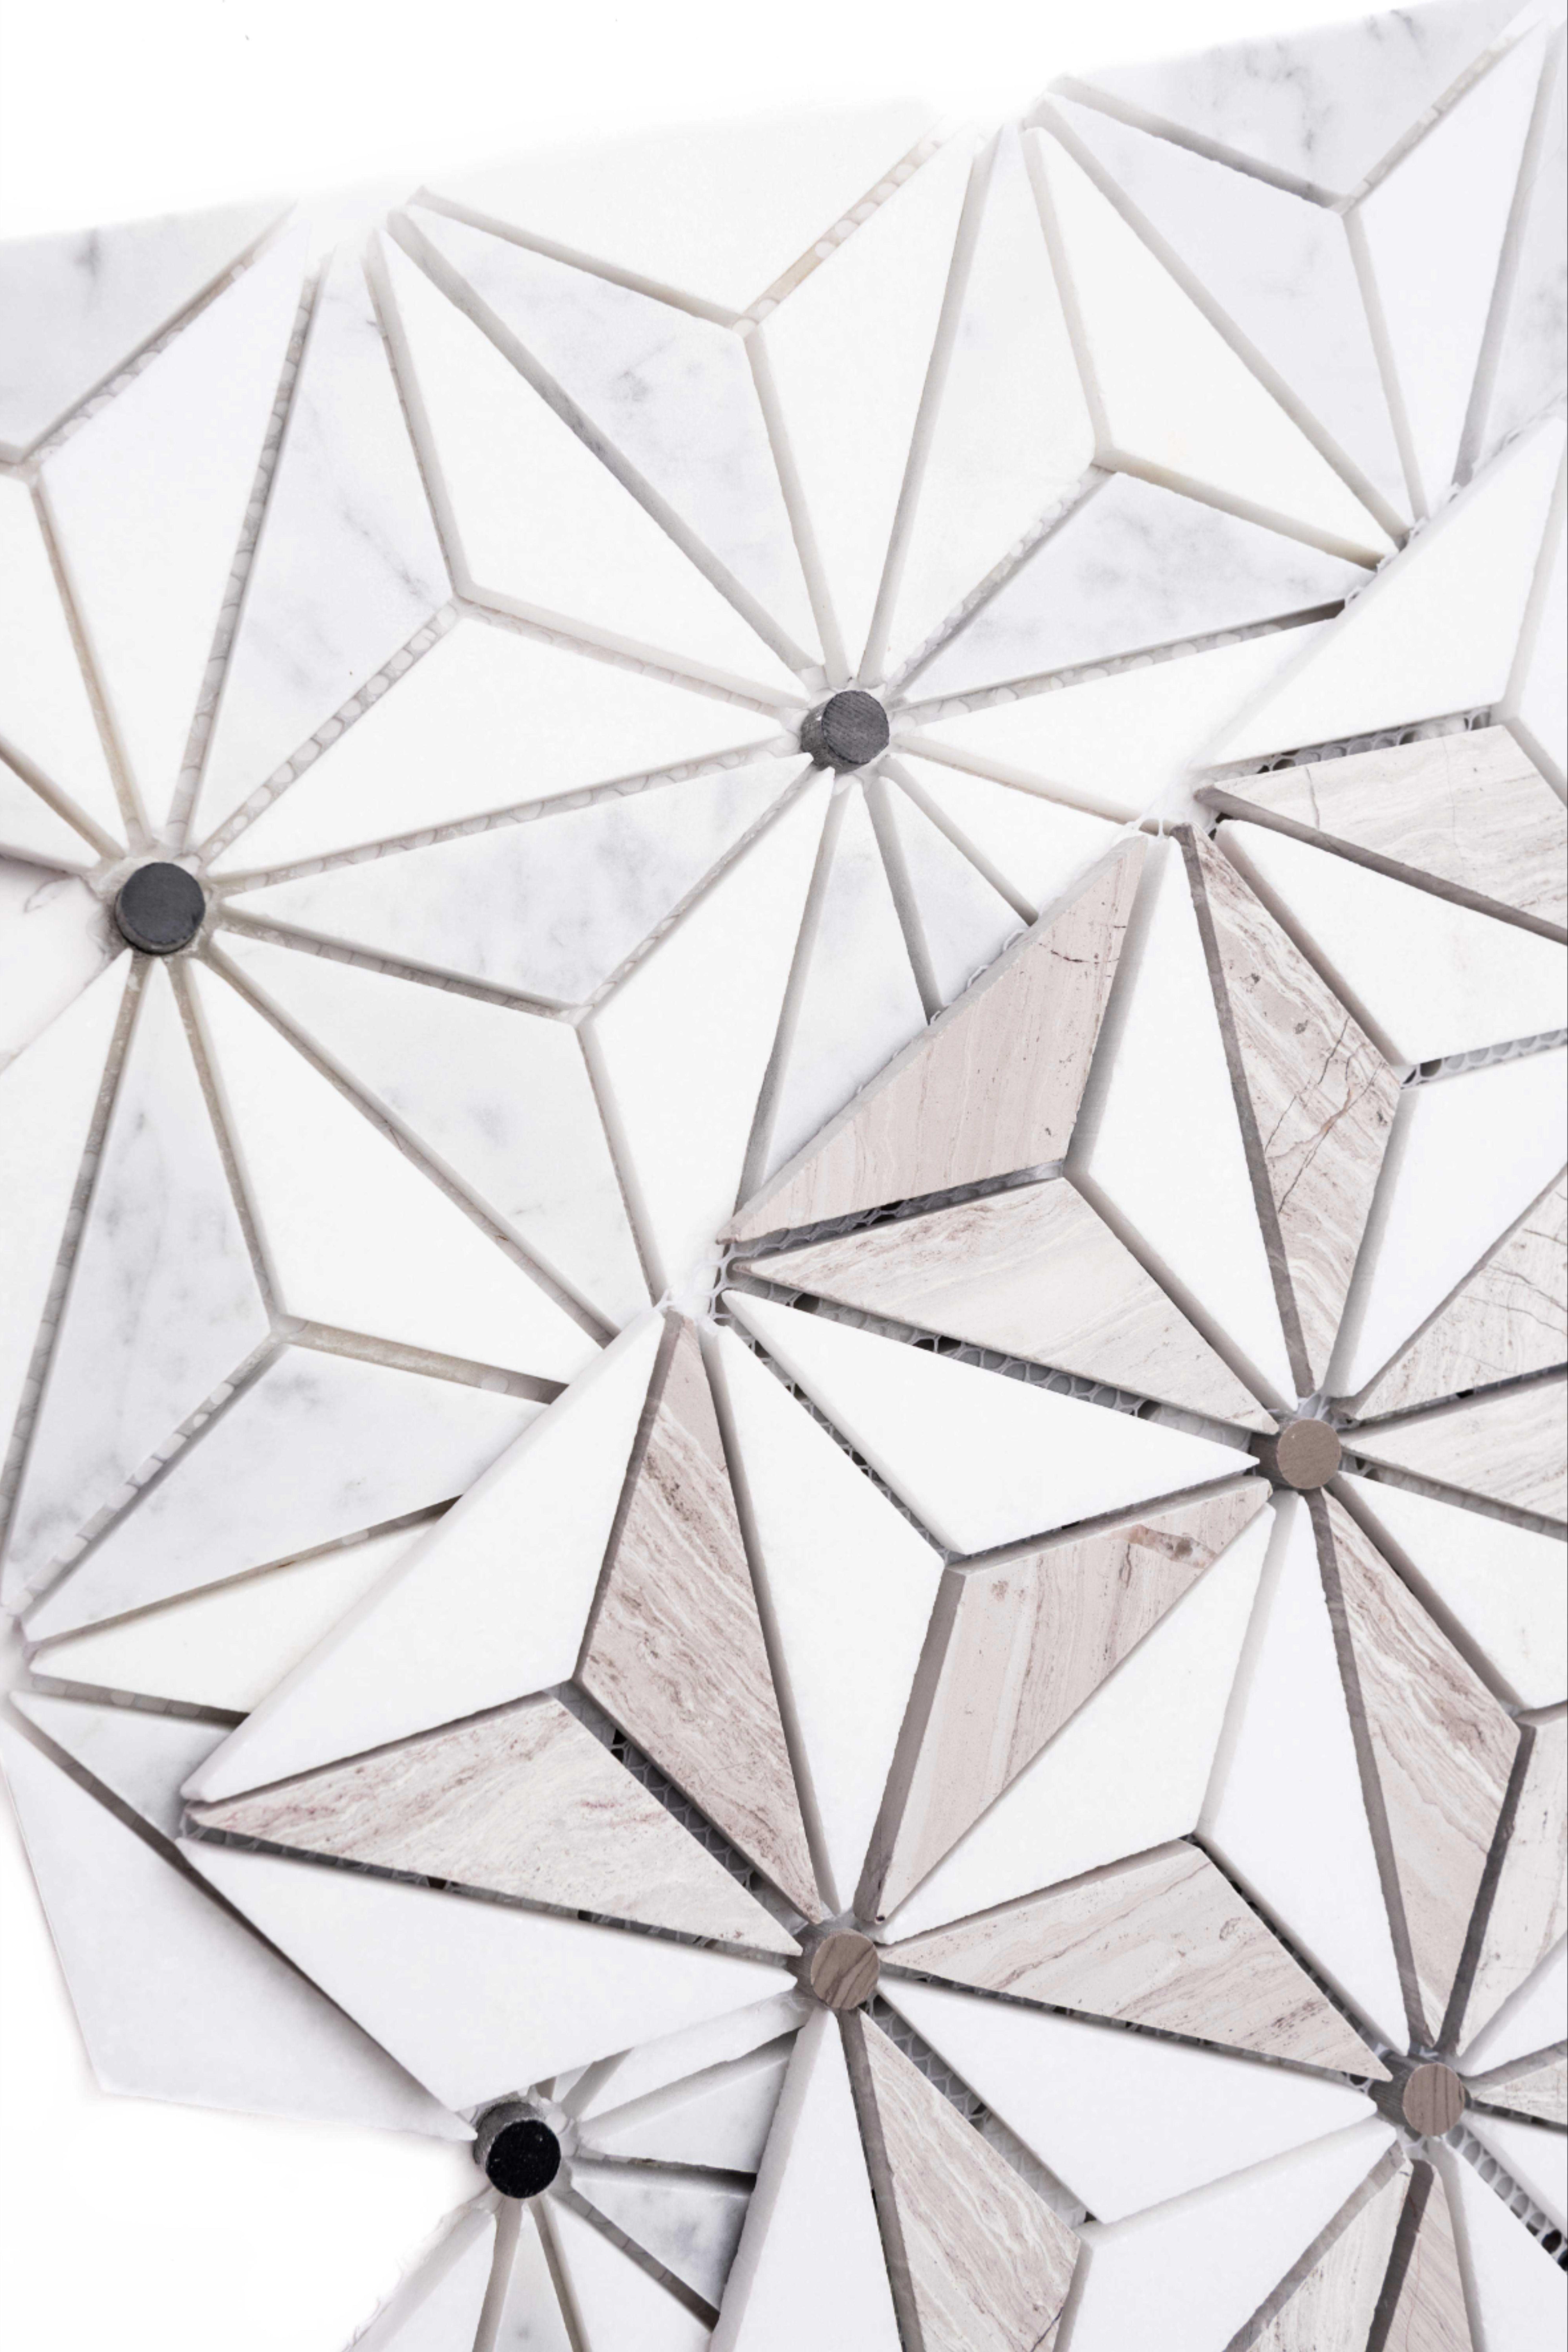 Santorini 1 X 3 Marble Mosaic Tile In 2020 Marble Mosaic Tiles Marble Mosaic Mosaic Tiles